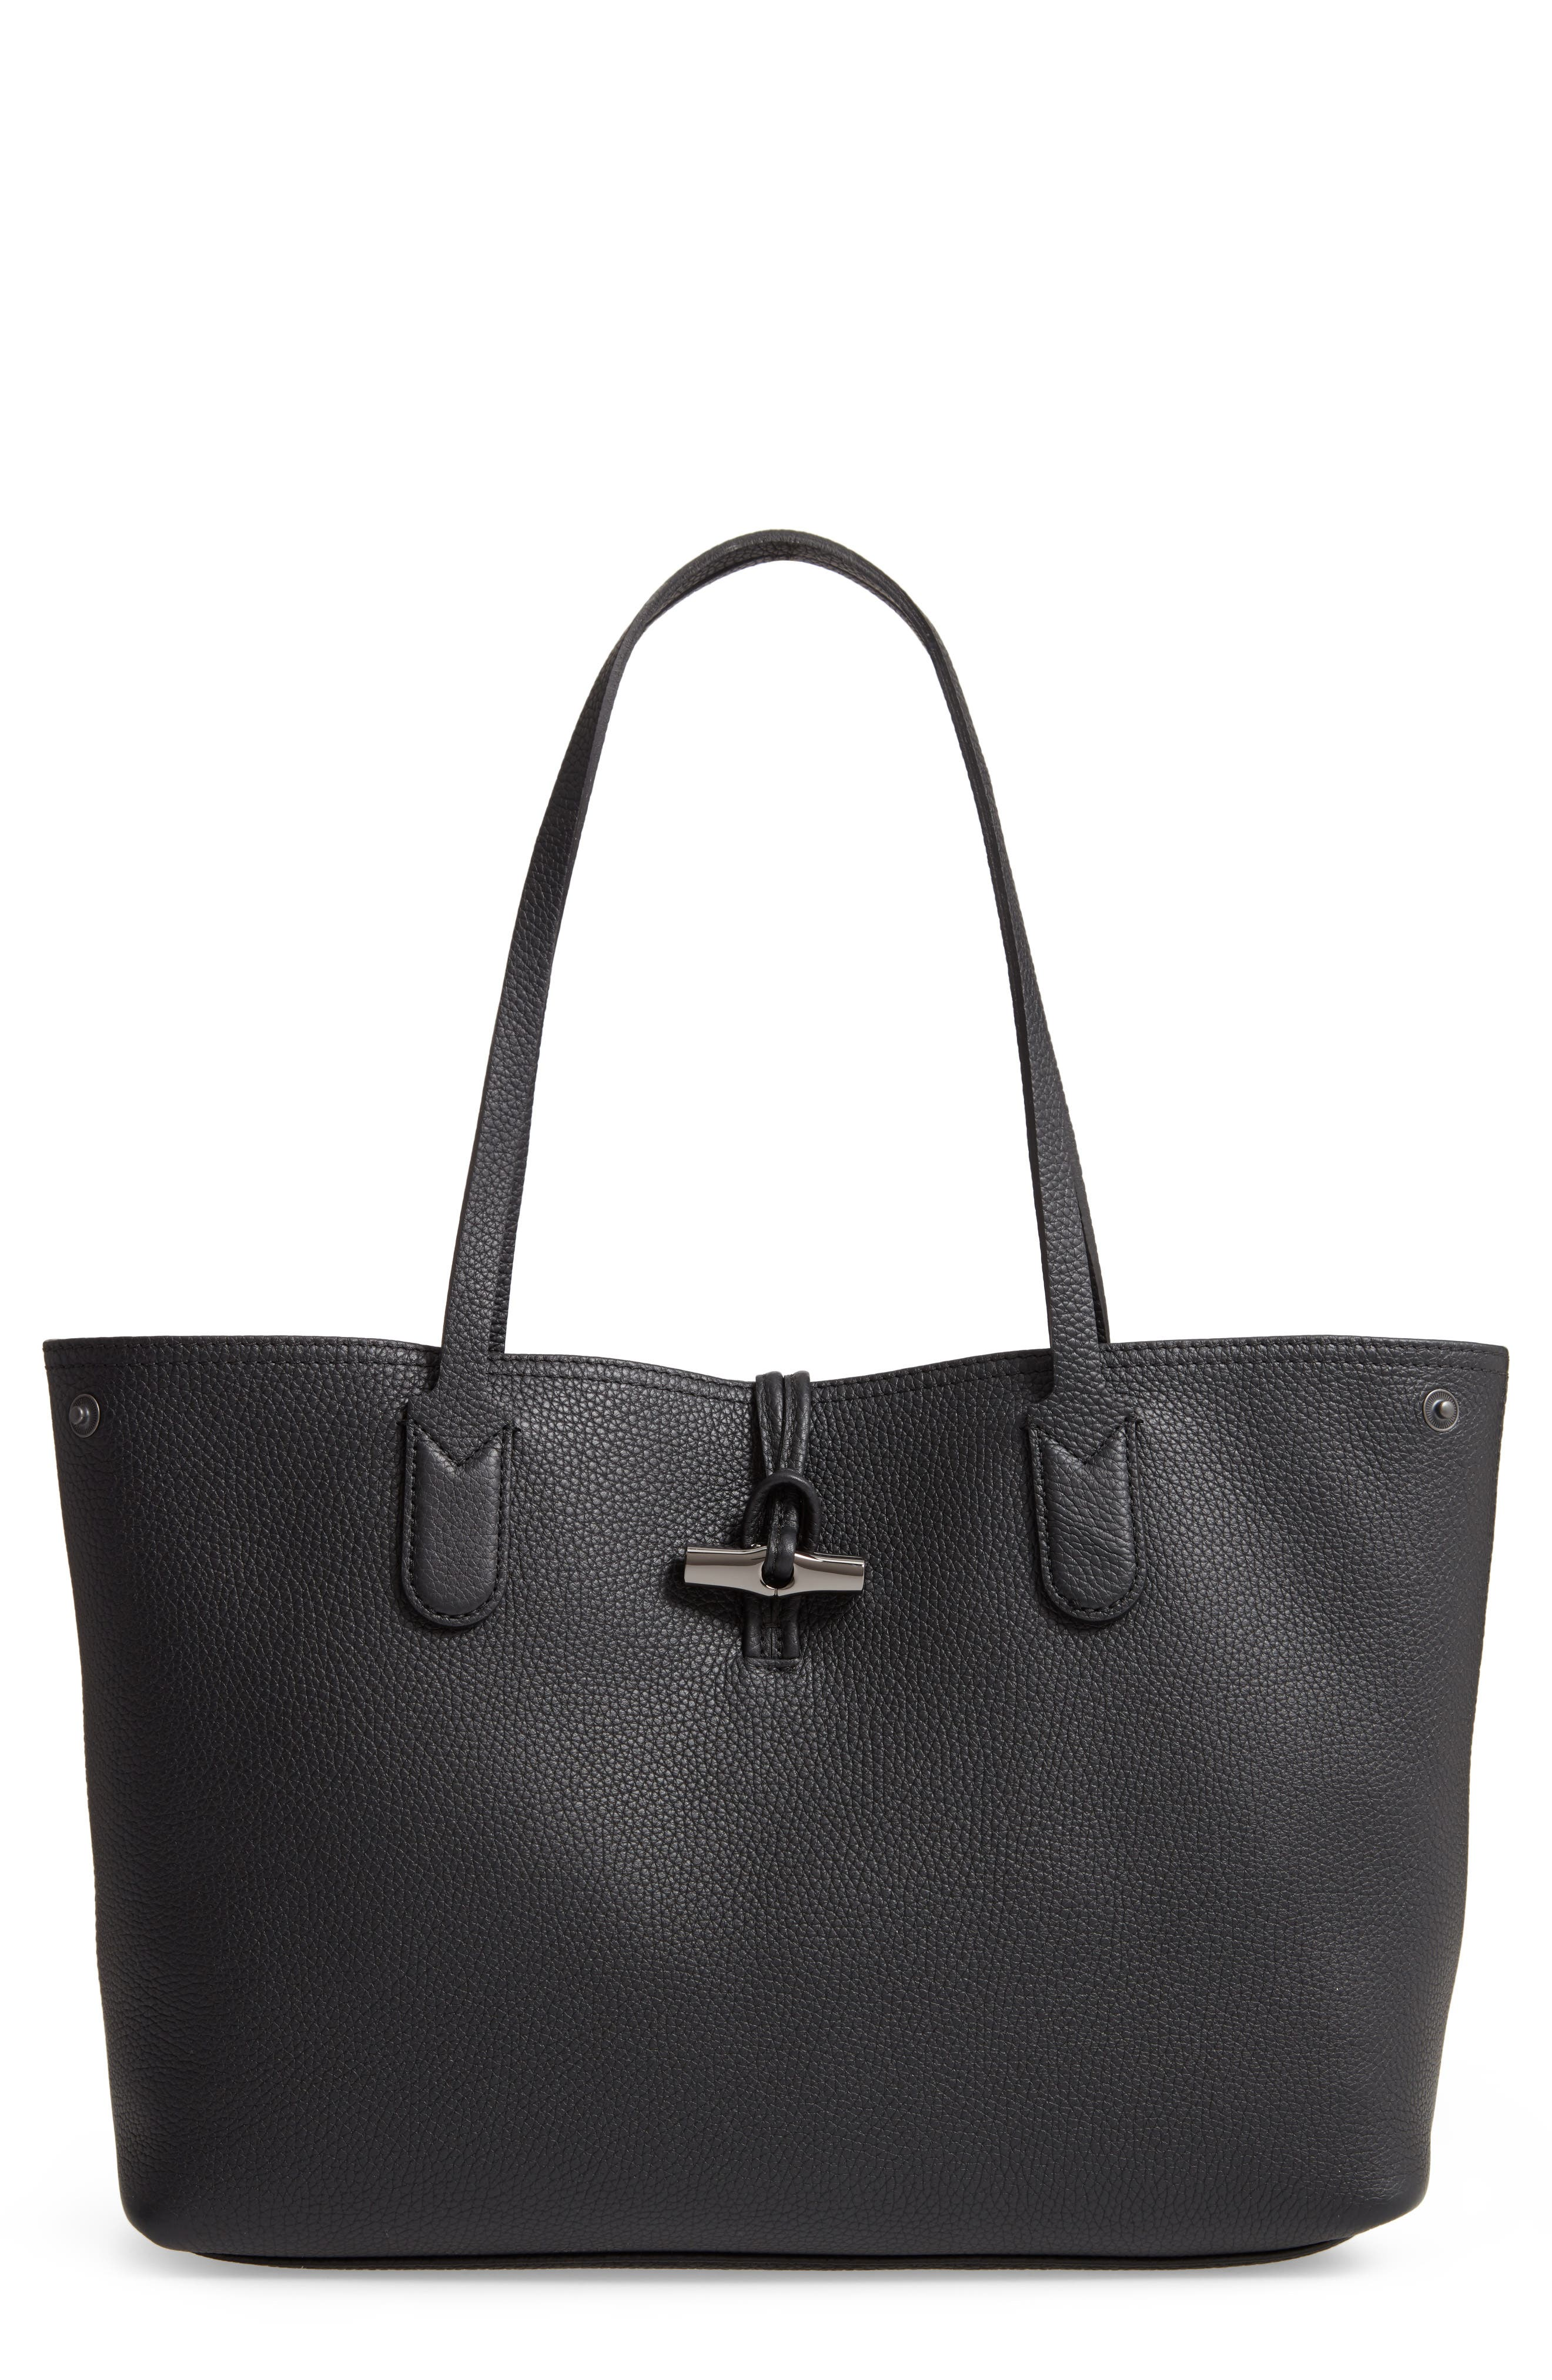 LONGCHAMP Roseau Essential Mid Leather Tote, Main, color, BLACK